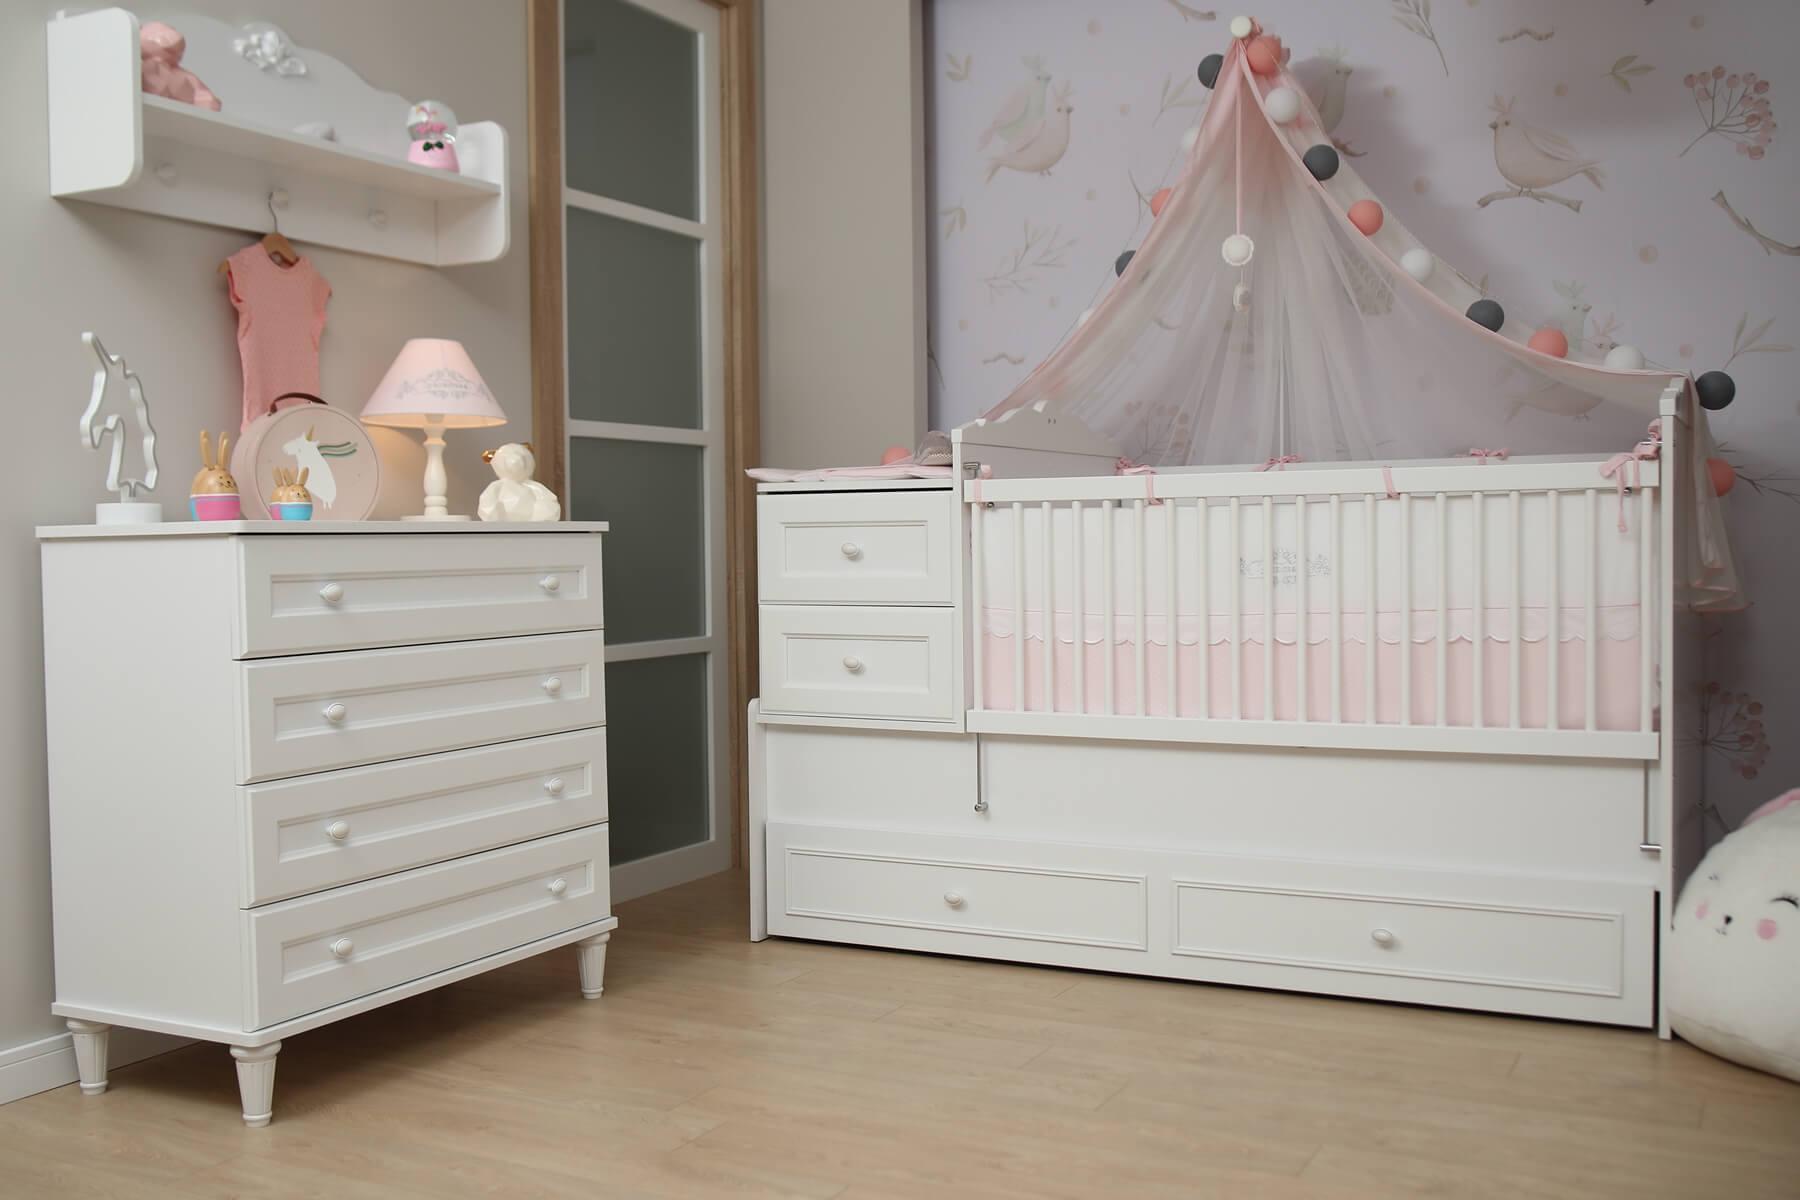 Almila Babyzimmer Set Lory 3-teilig in Weiß